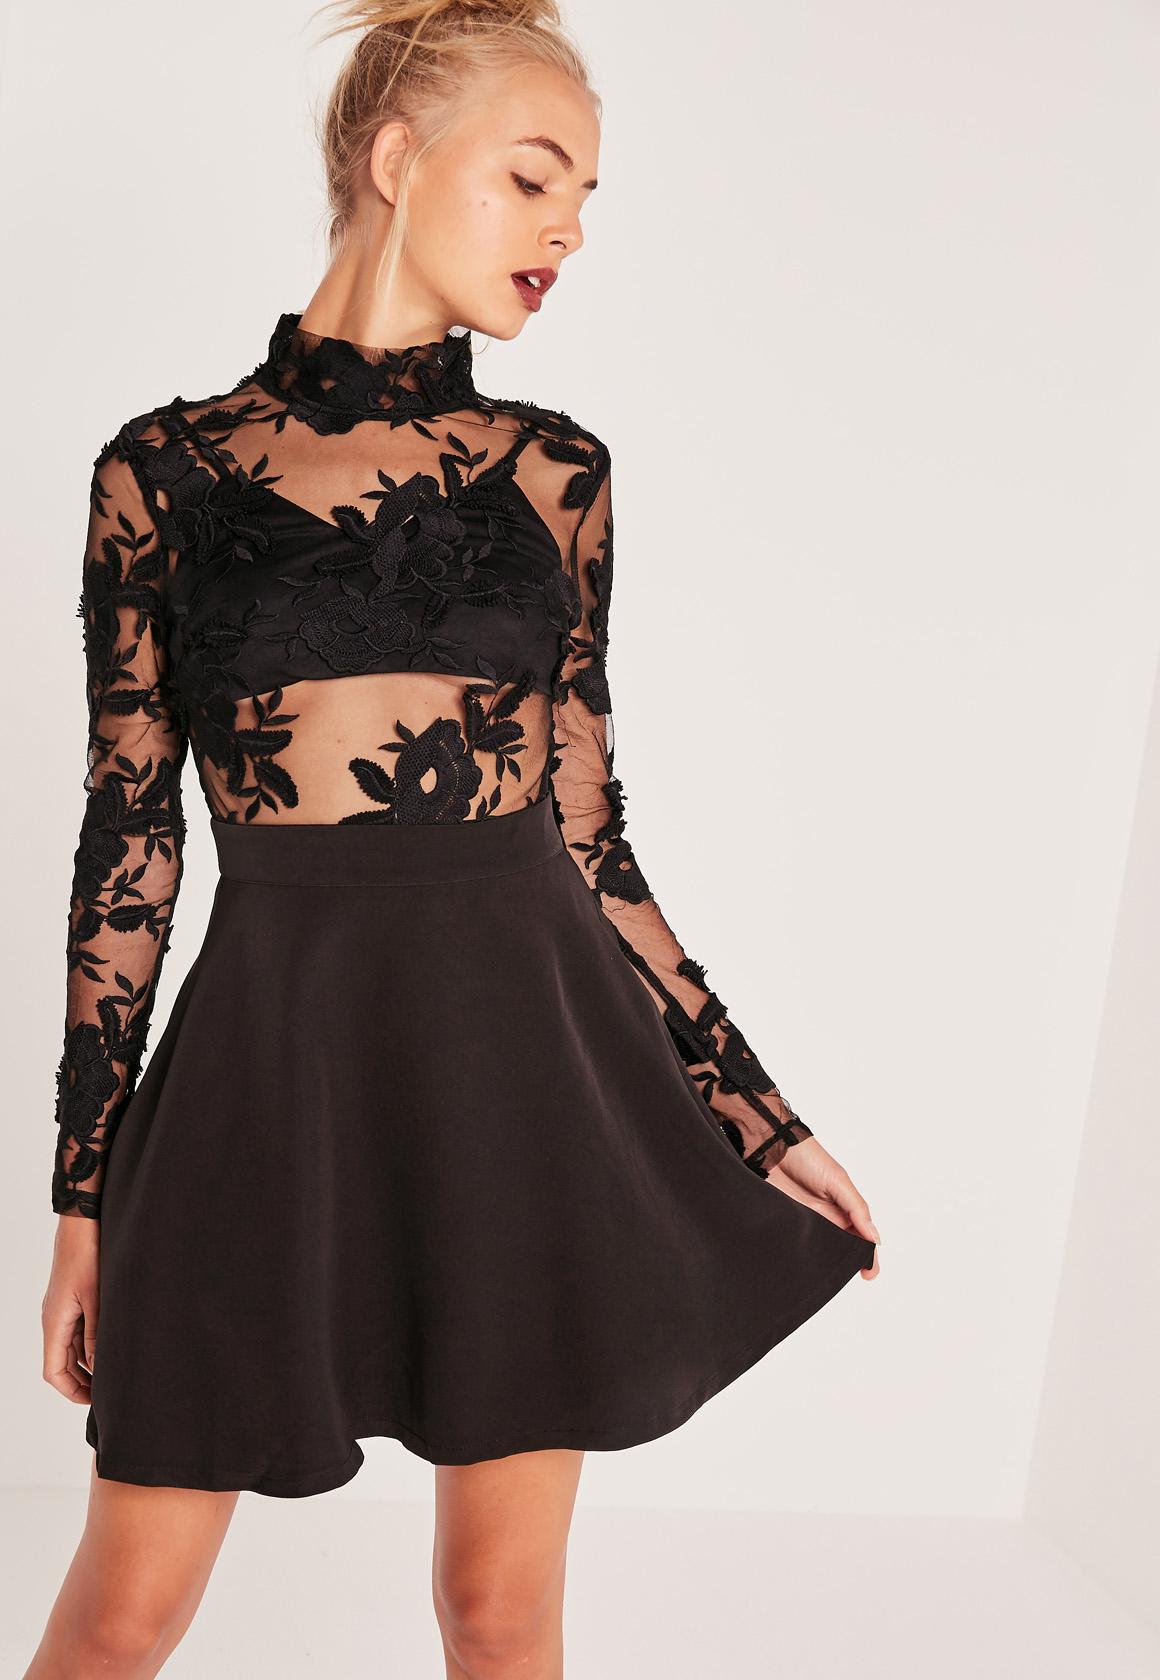 Long Sleeve Lace Skater Dress Dress Ideas